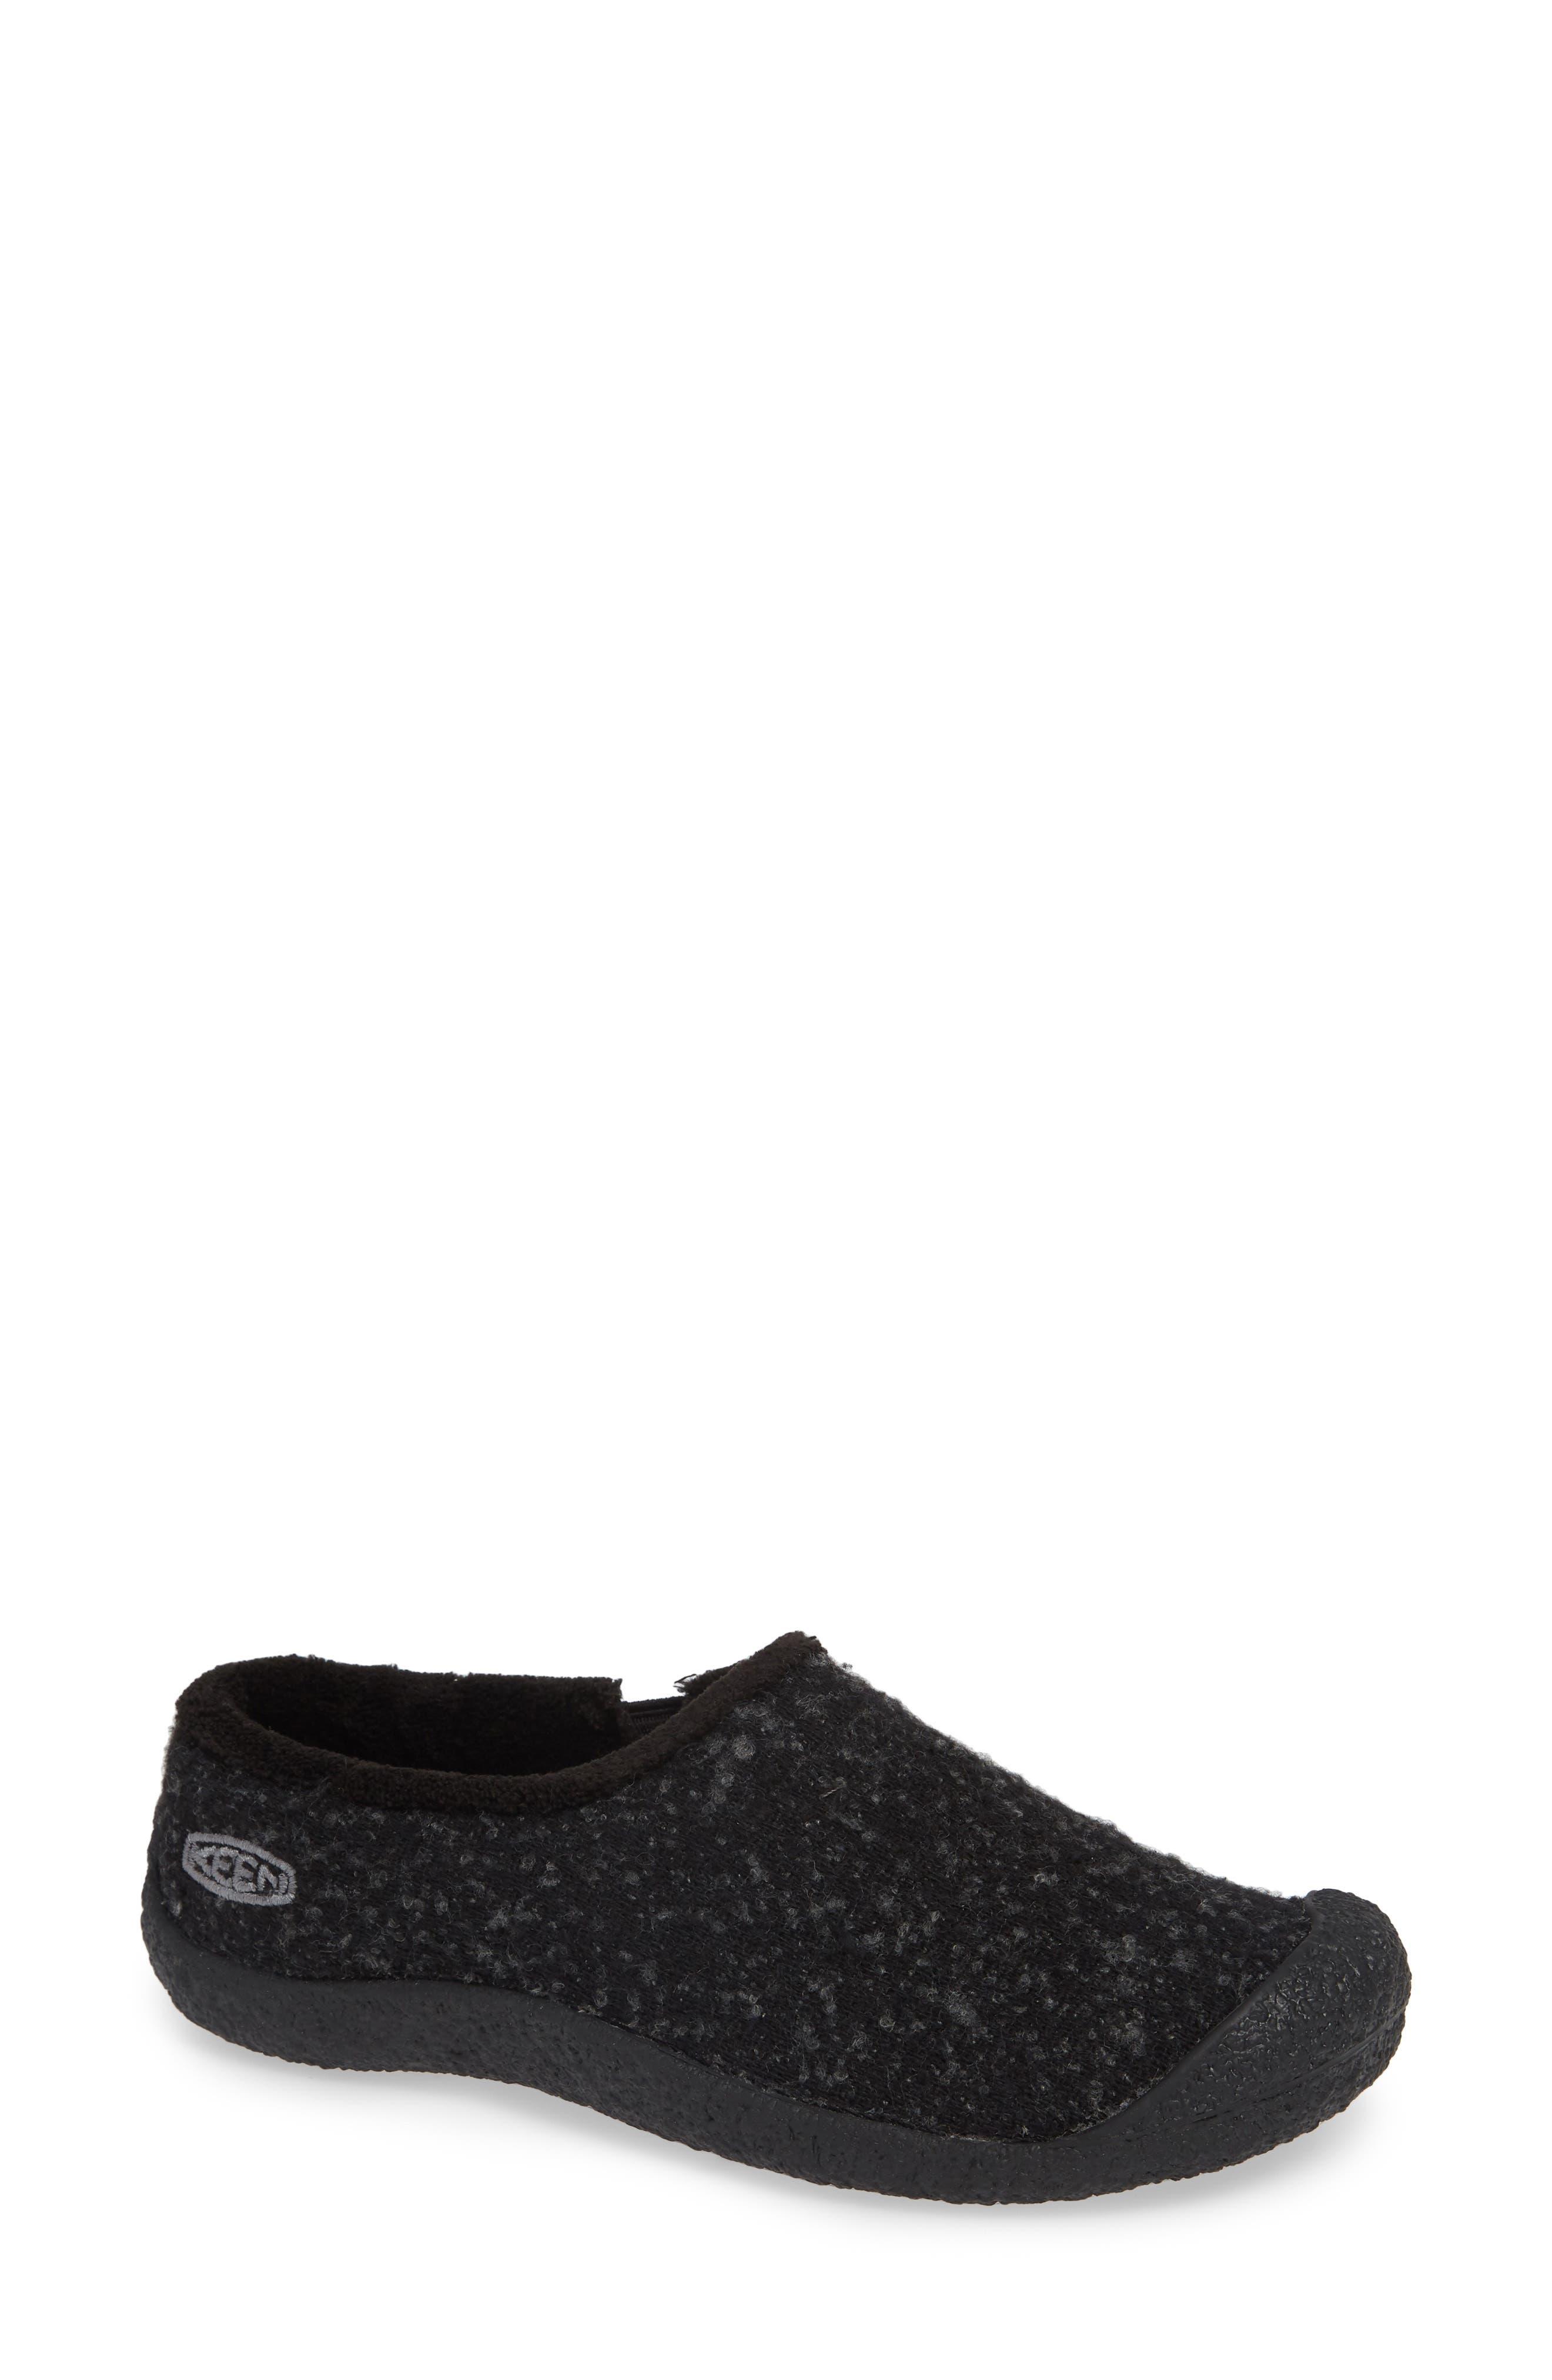 Howser Round Toe Wool Slip-on,                         Main,                         color, BLACK KNOBBY/ STEEL GREY WOOL